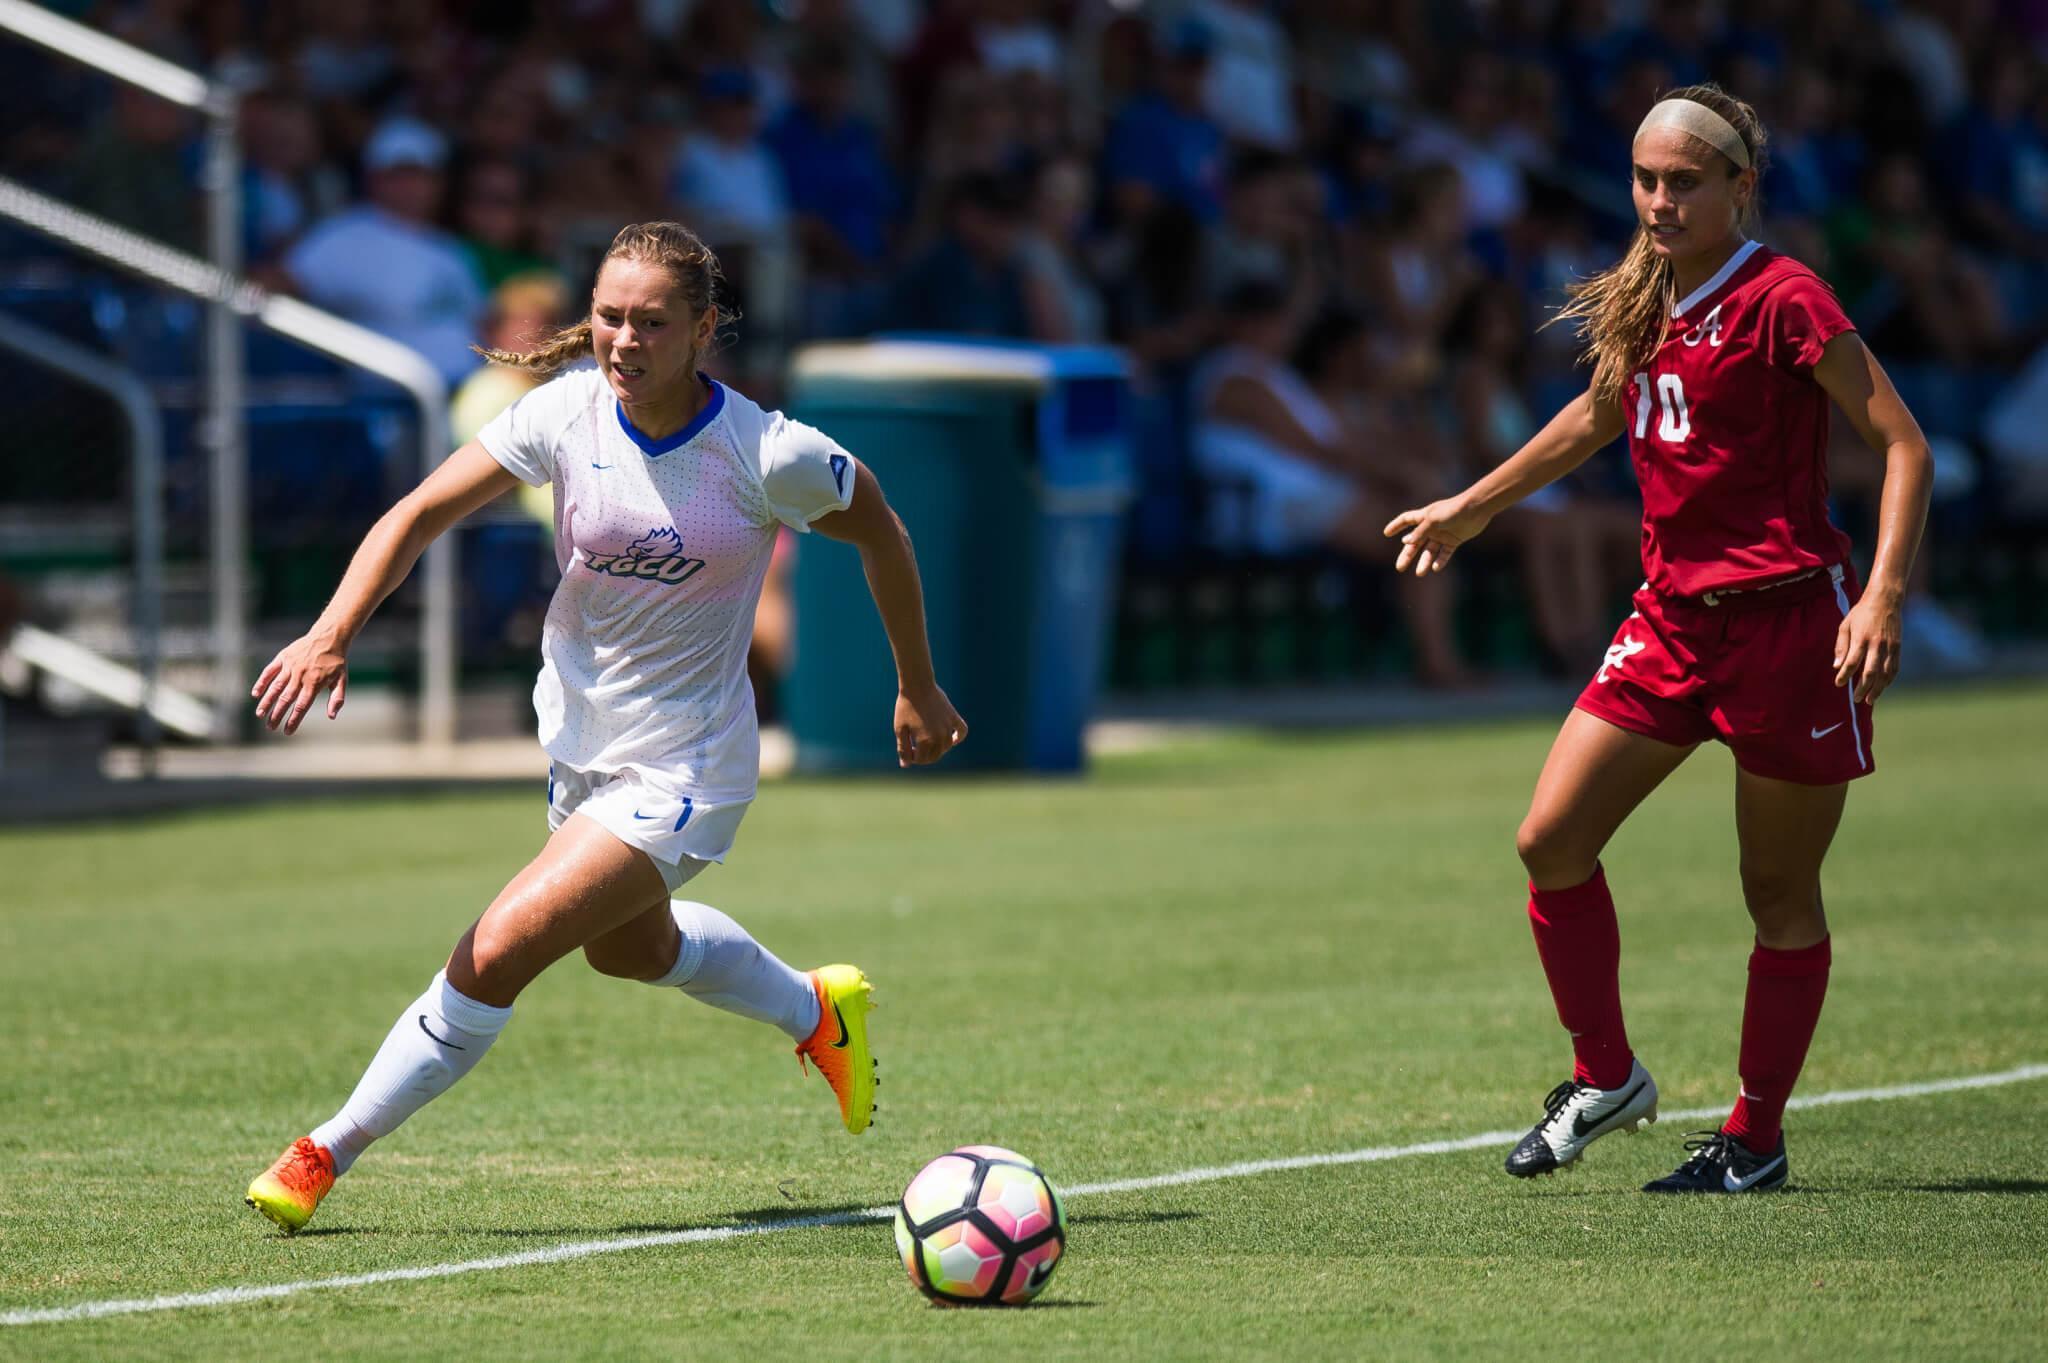 FGCU women's soccer team falls to SEC heavyweight Alabama 1-0